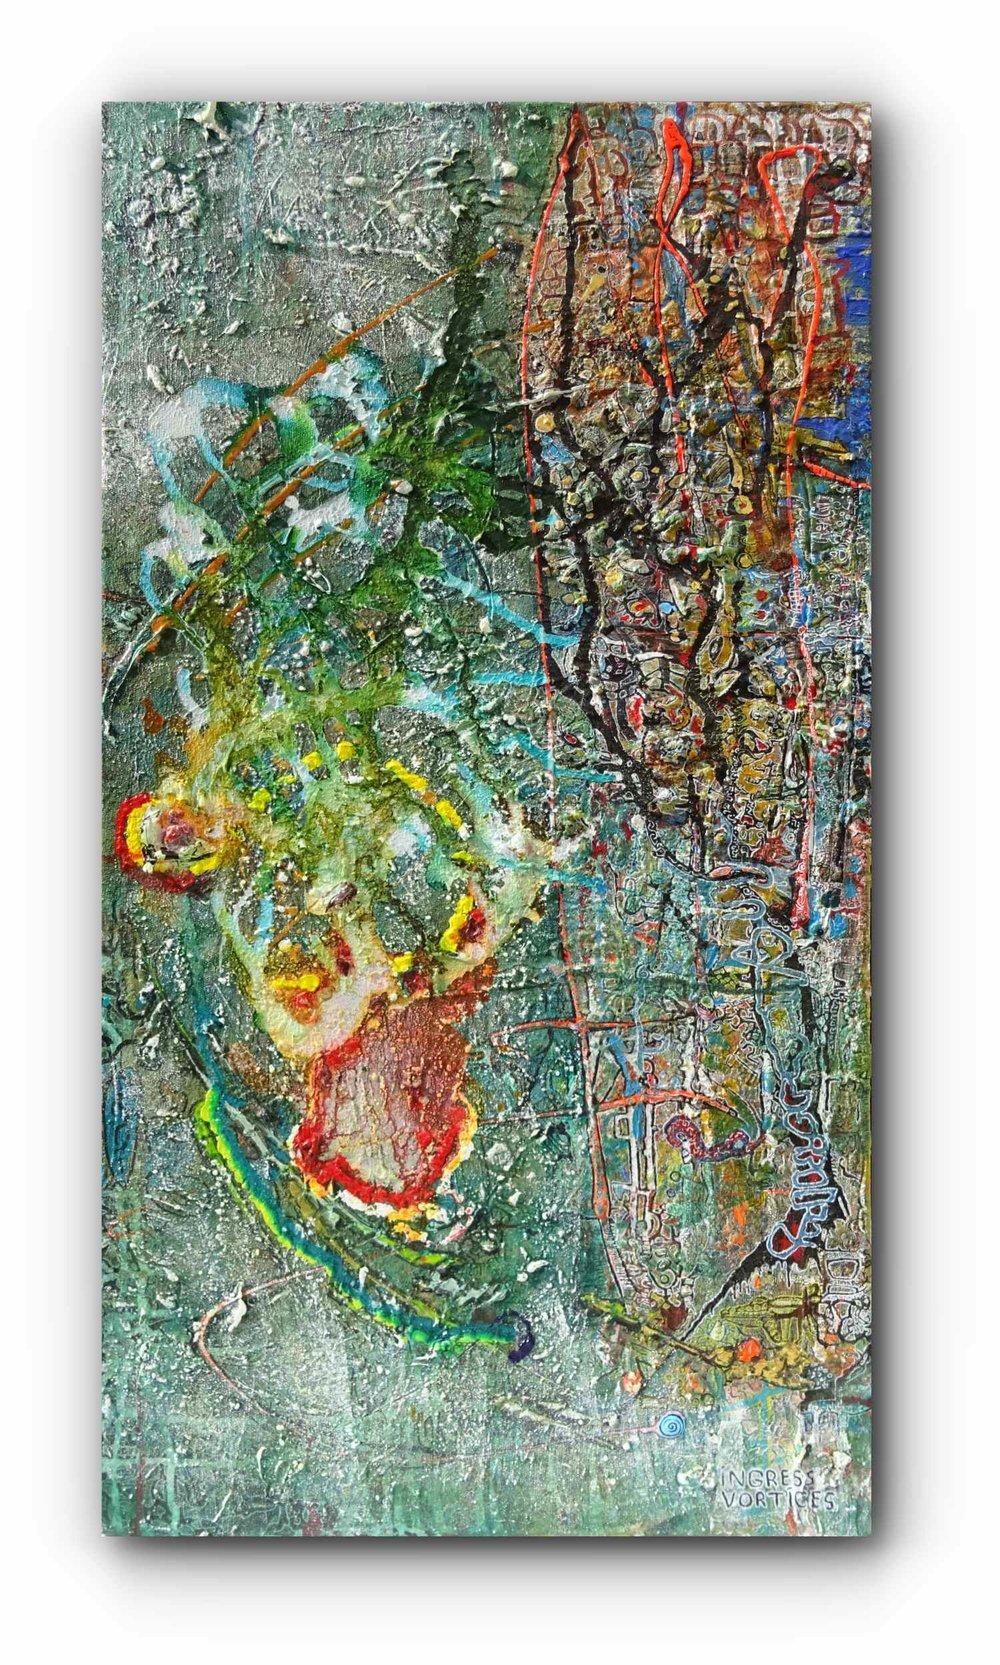 painting-ritual-five-artist-duo-ingress-vortices.jpg